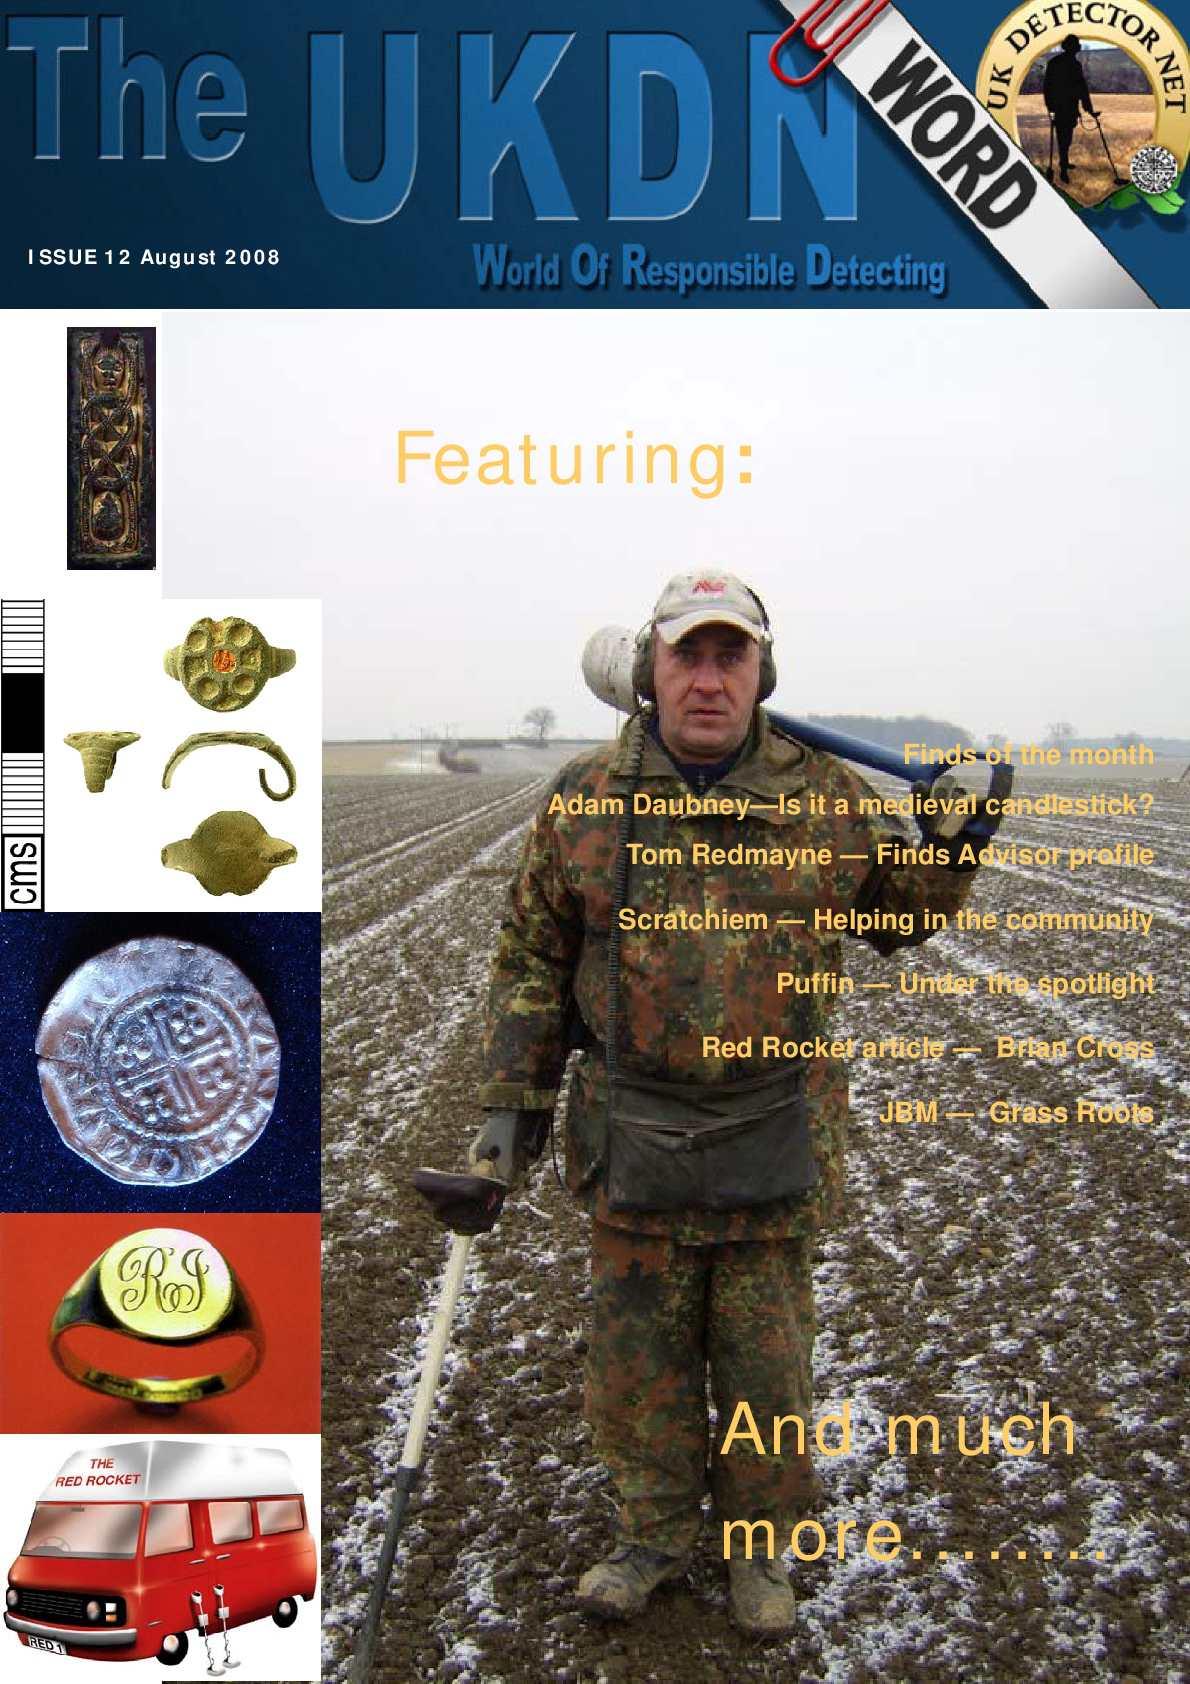 UKDN Word Issue 12 August 2008